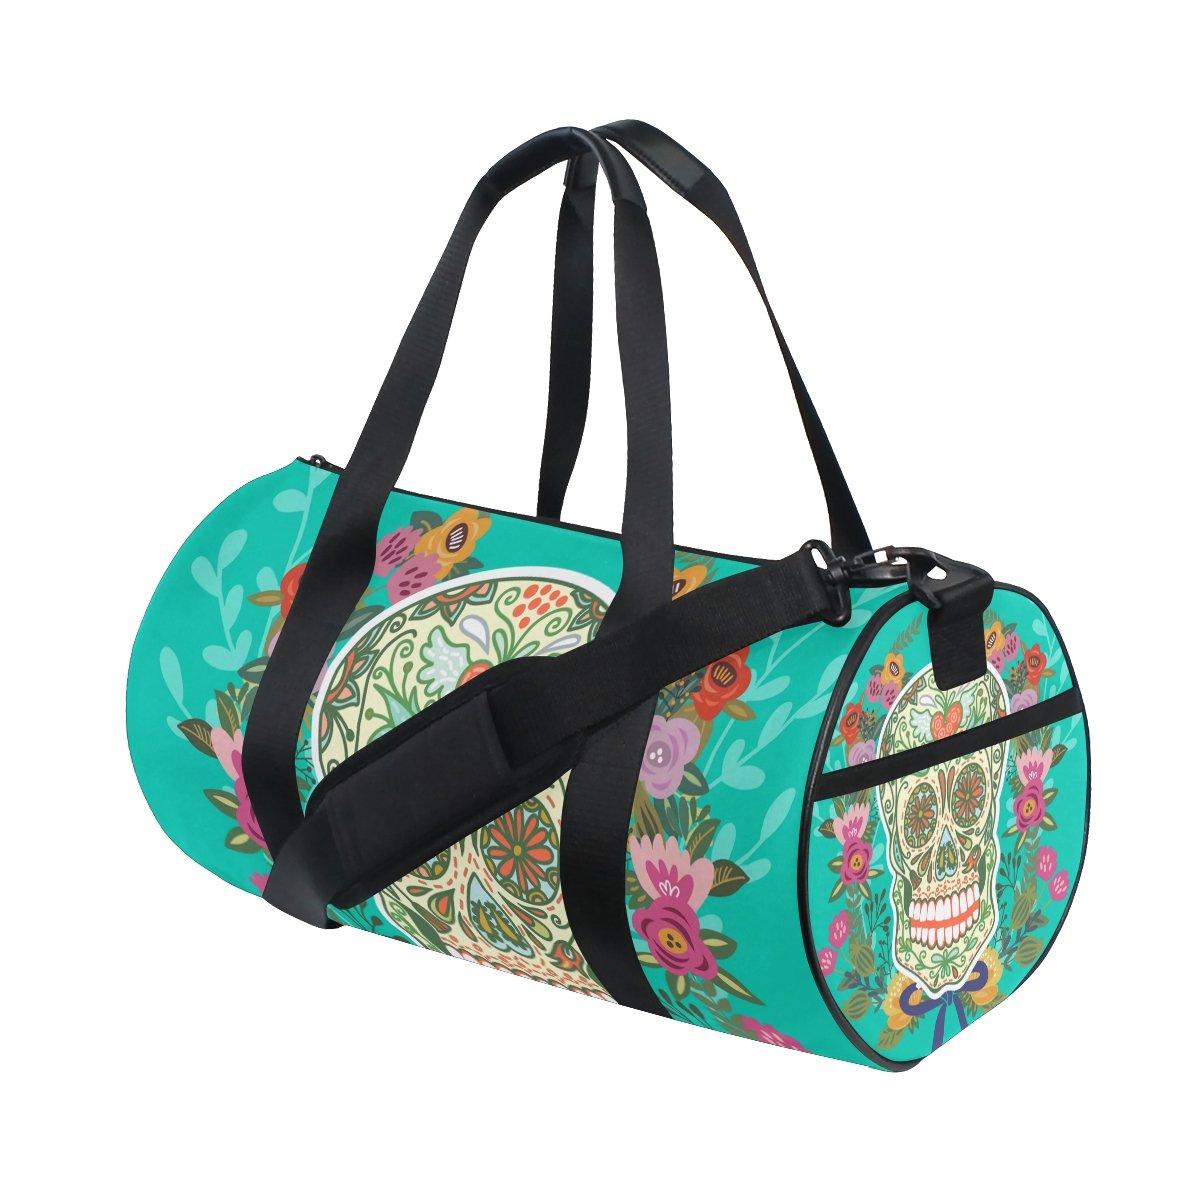 Sugar Skull Dia De Los Muertos Travel Duffel Shoulder Bag, Sports Gym Fitness Bags